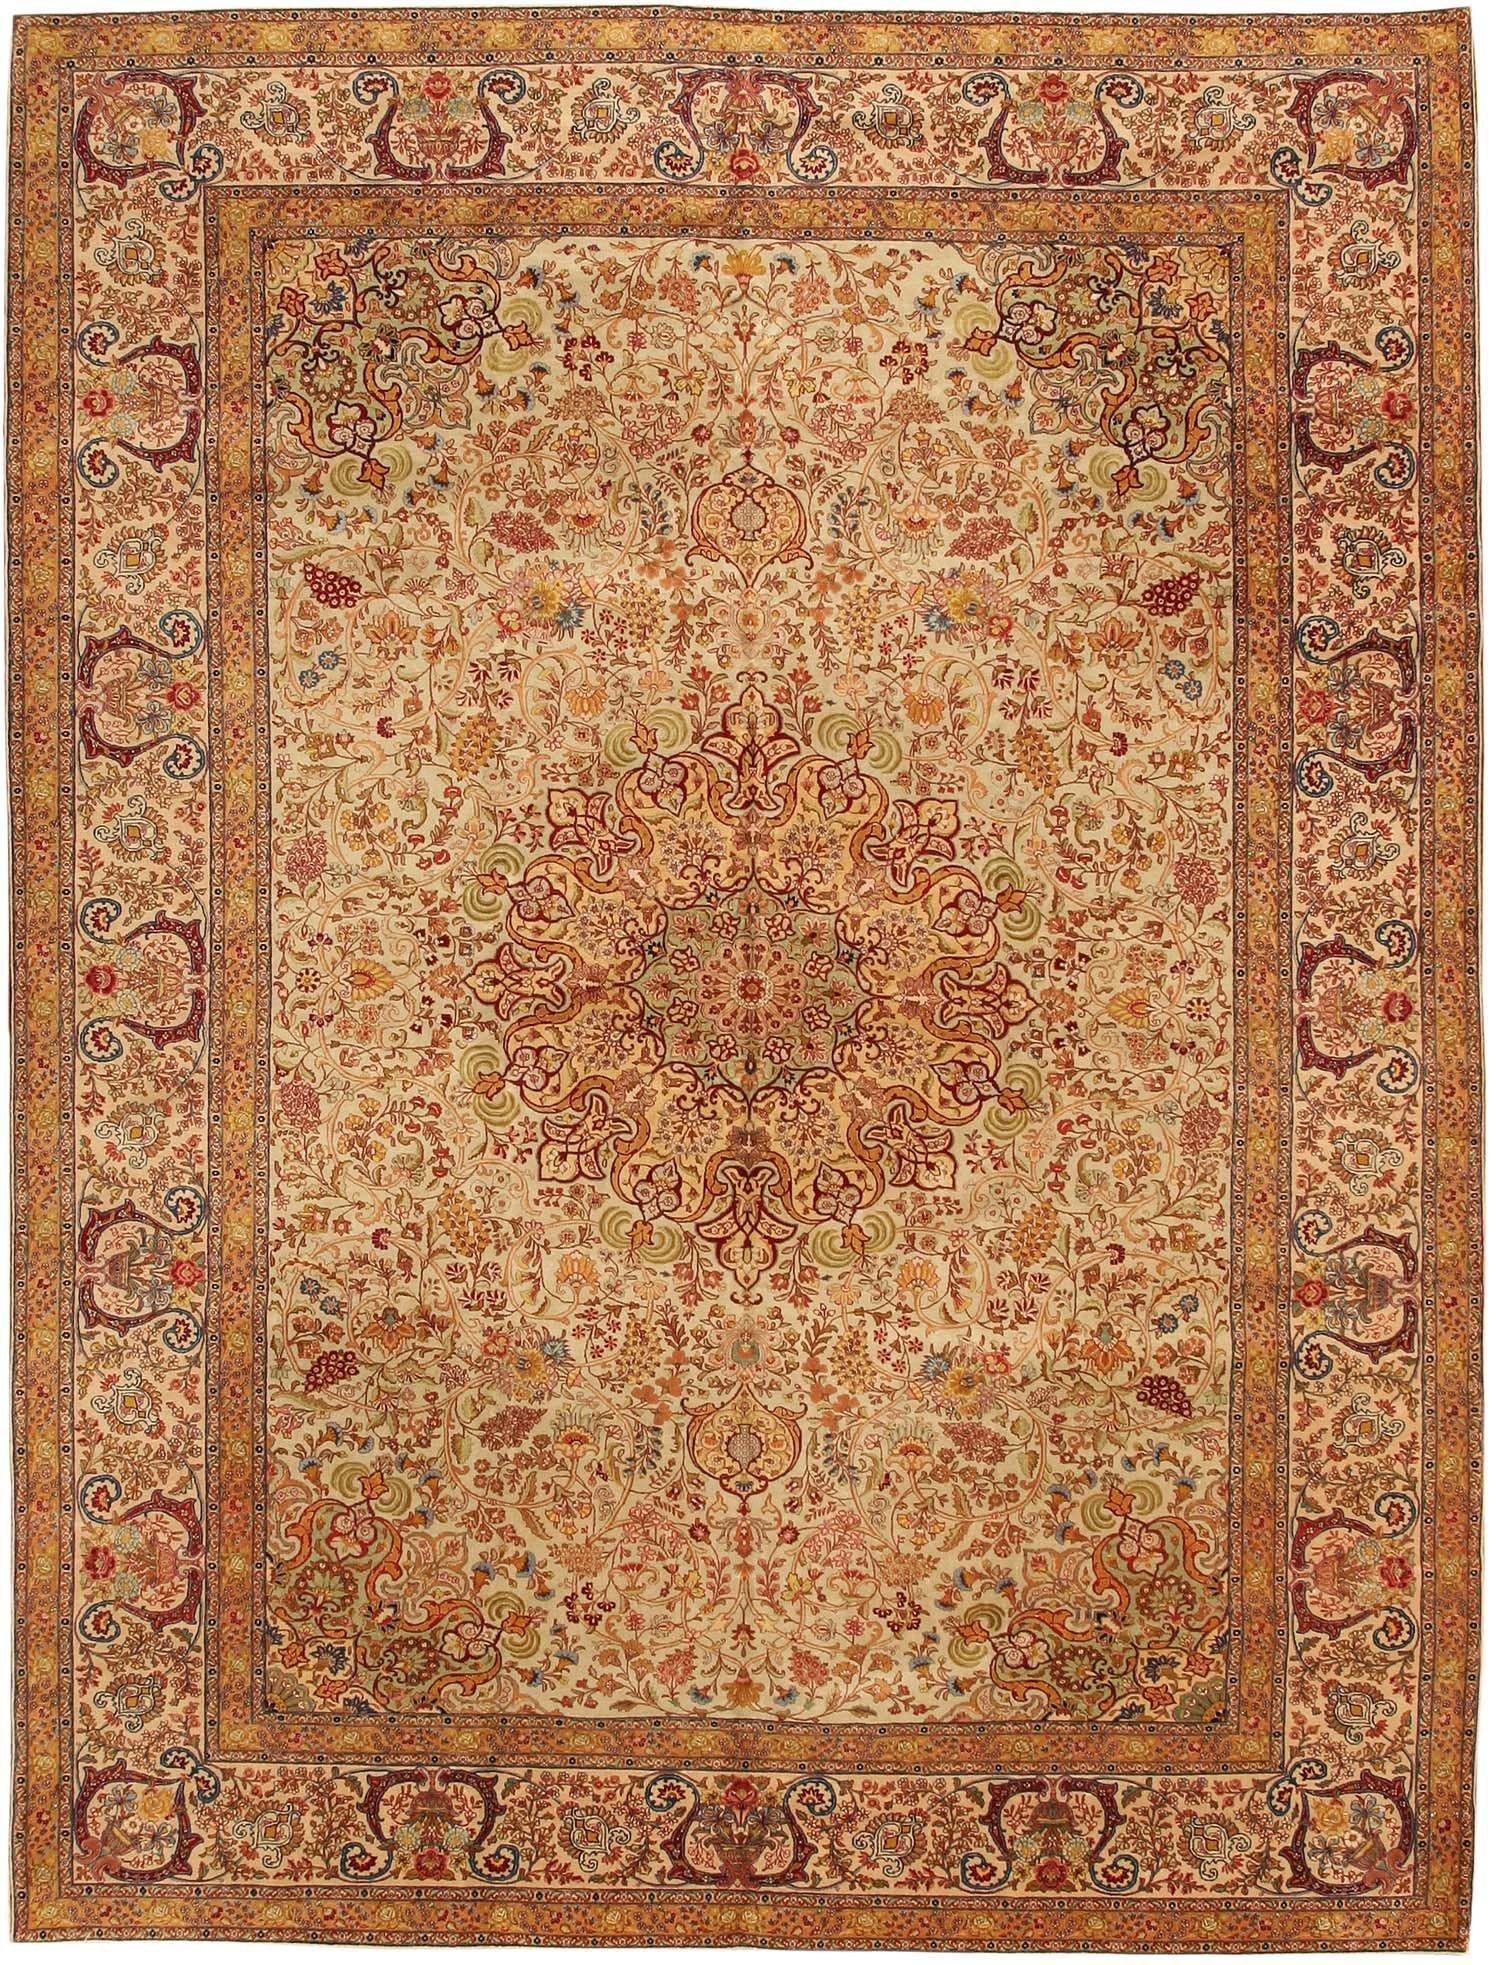 Pictures Of Antique Rugs Tabriz Rug Persian Carpet